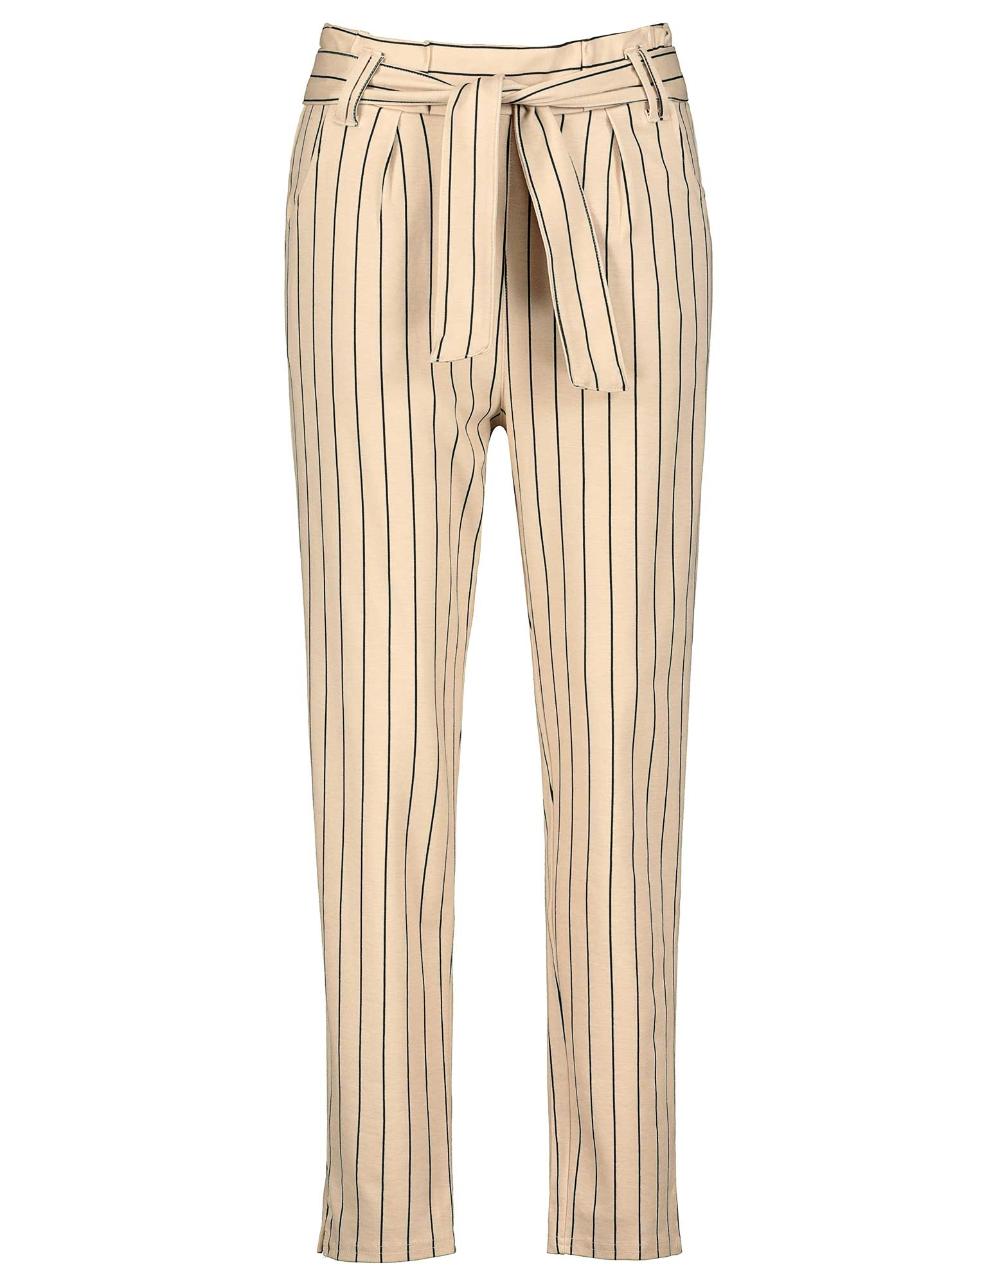 Damen Stoffhose Mit Viskoseanteil Takko Fashion In 2020 Hosen Damen Lange Hosen Stoffhose